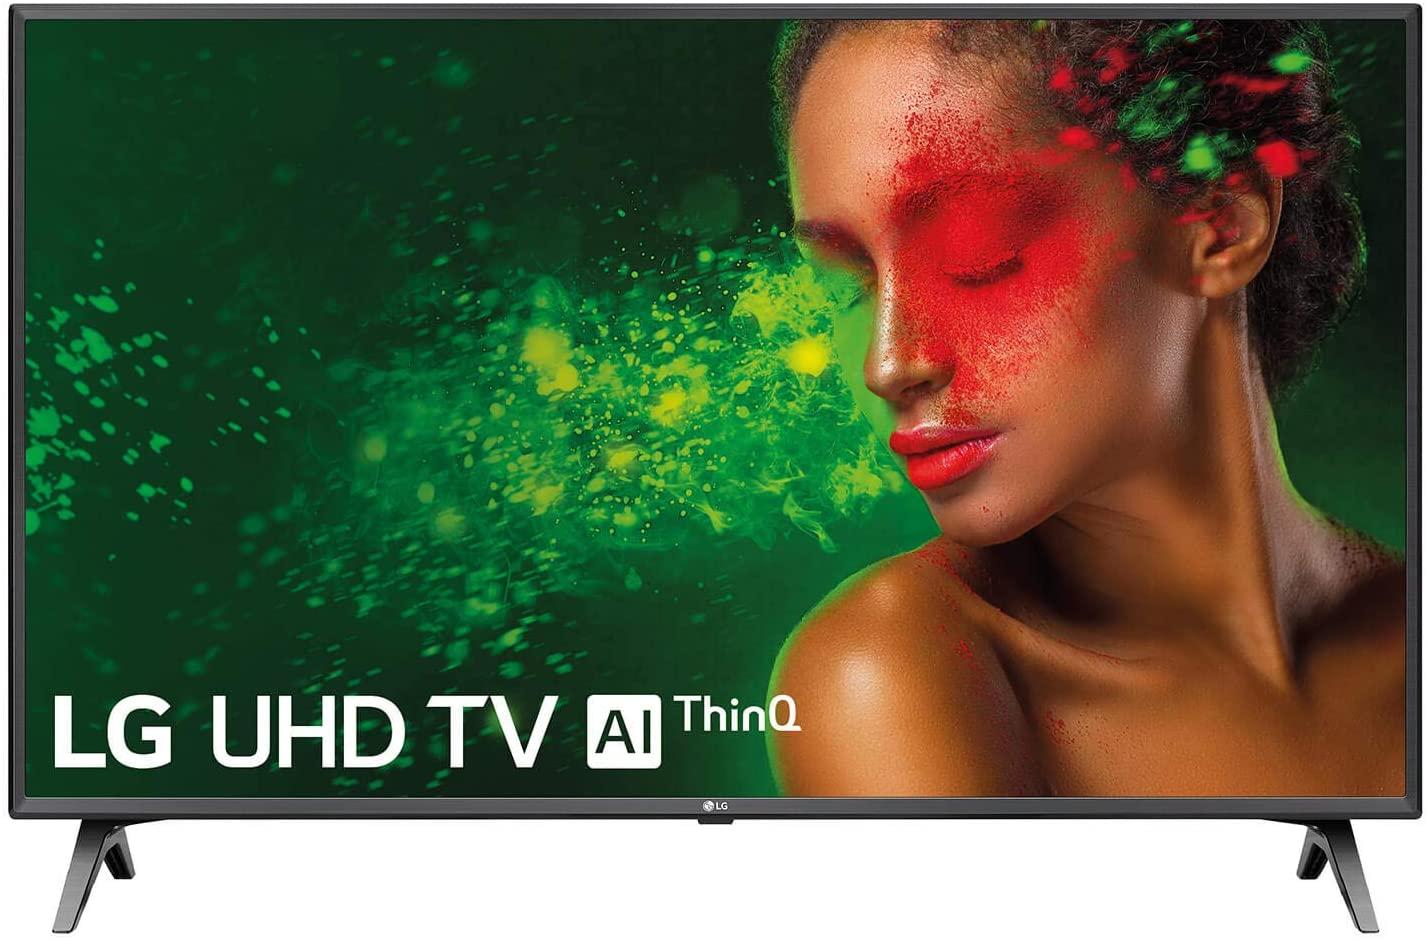 "LG 43UM7500PLA - Smart TV 4K, UHD, de 108 cm, 43"", Works With Alexa (Panel IPS, HDR, webOS 4.5, Alexa, Asistente de Google, Procesador Quad Core, Sonido DTS Virtual:X), Color Negro [Clase de eficiencia energética A]"